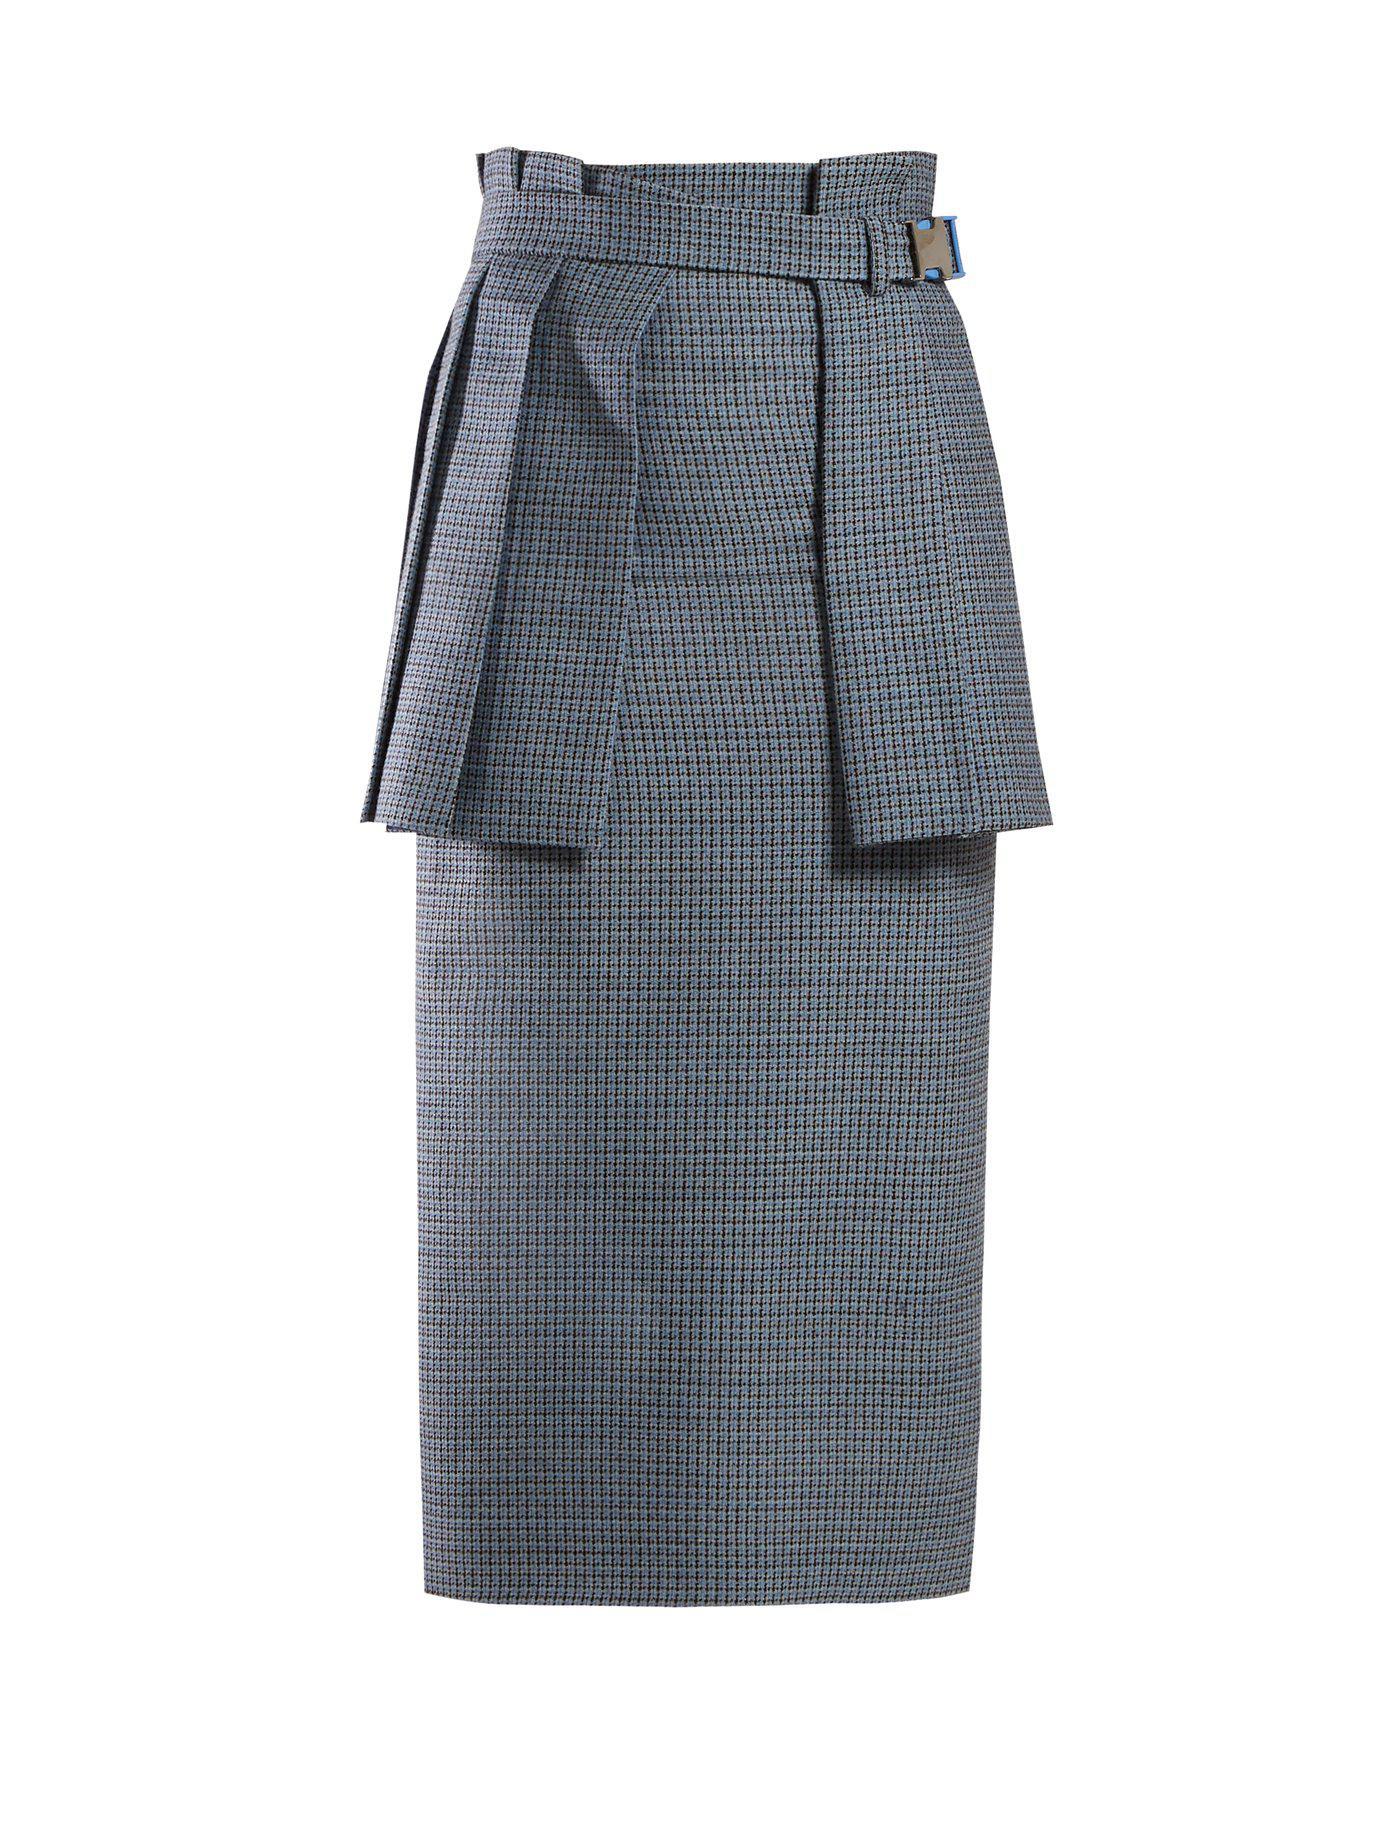 e550d928d9 Lyst - Fendi Pleated Panel Wool Blend Tweed Pencil Skirt in Blue